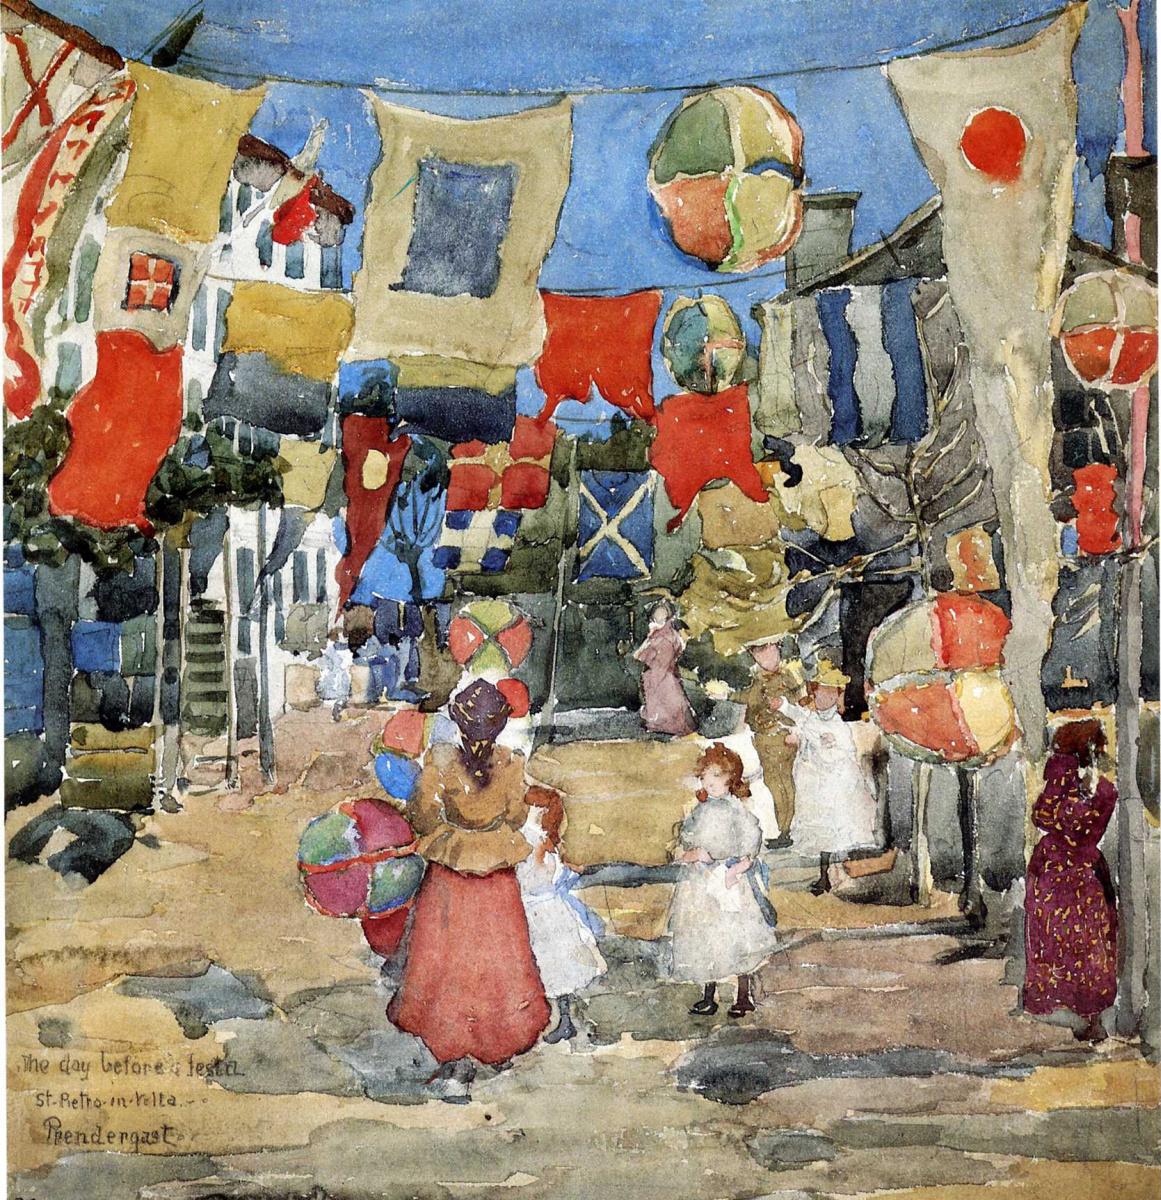 Морис Брэзил Прендергаст. Праздник - Венеция, Сан Пьетро в Вольта